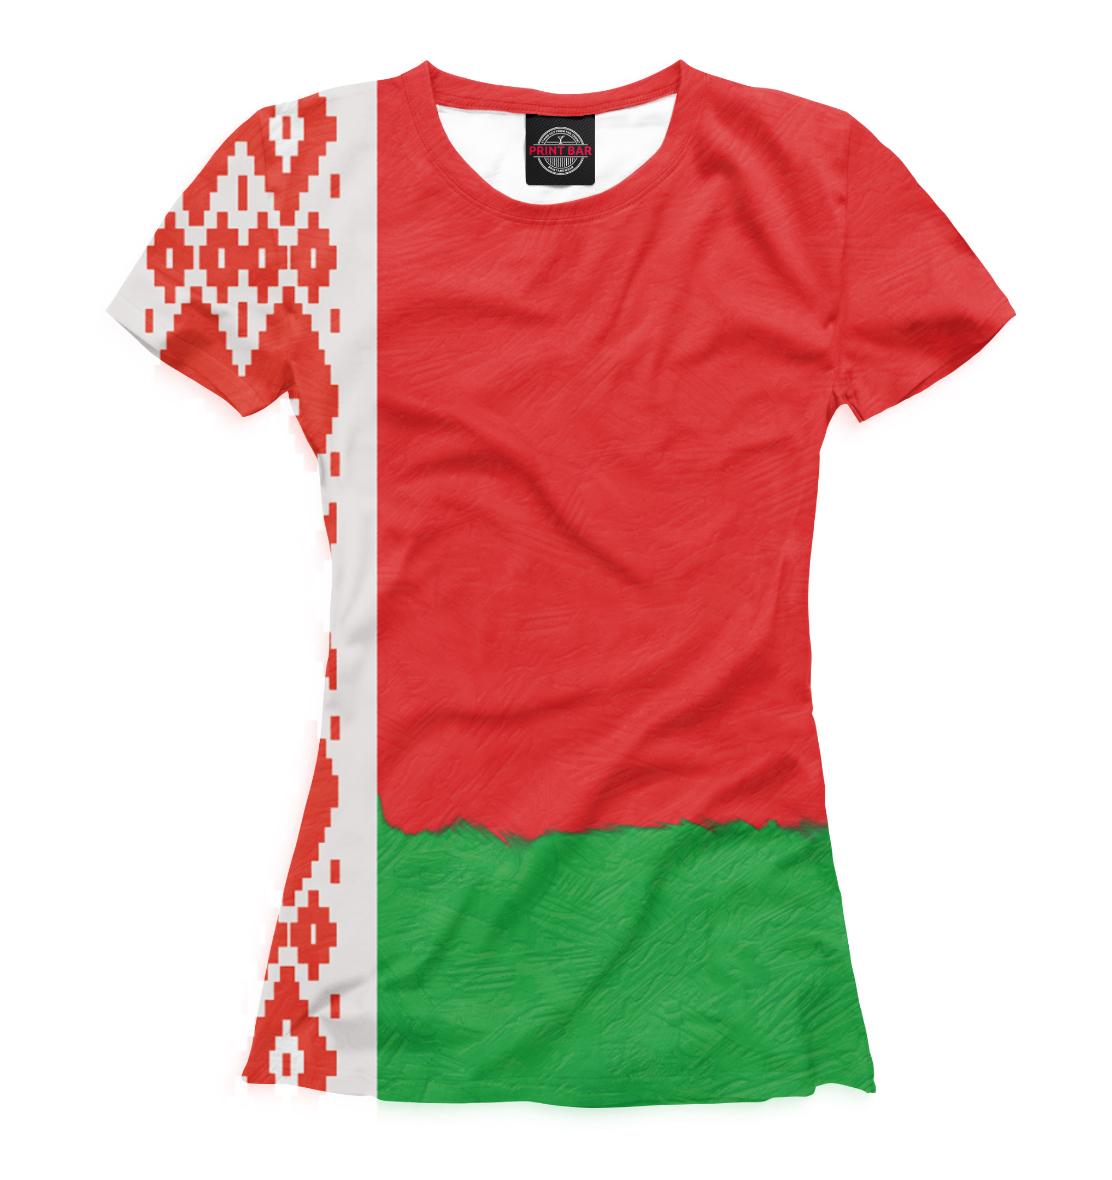 Купить Беларусь, Printbar, Футболки, BLR-741943-fut-1